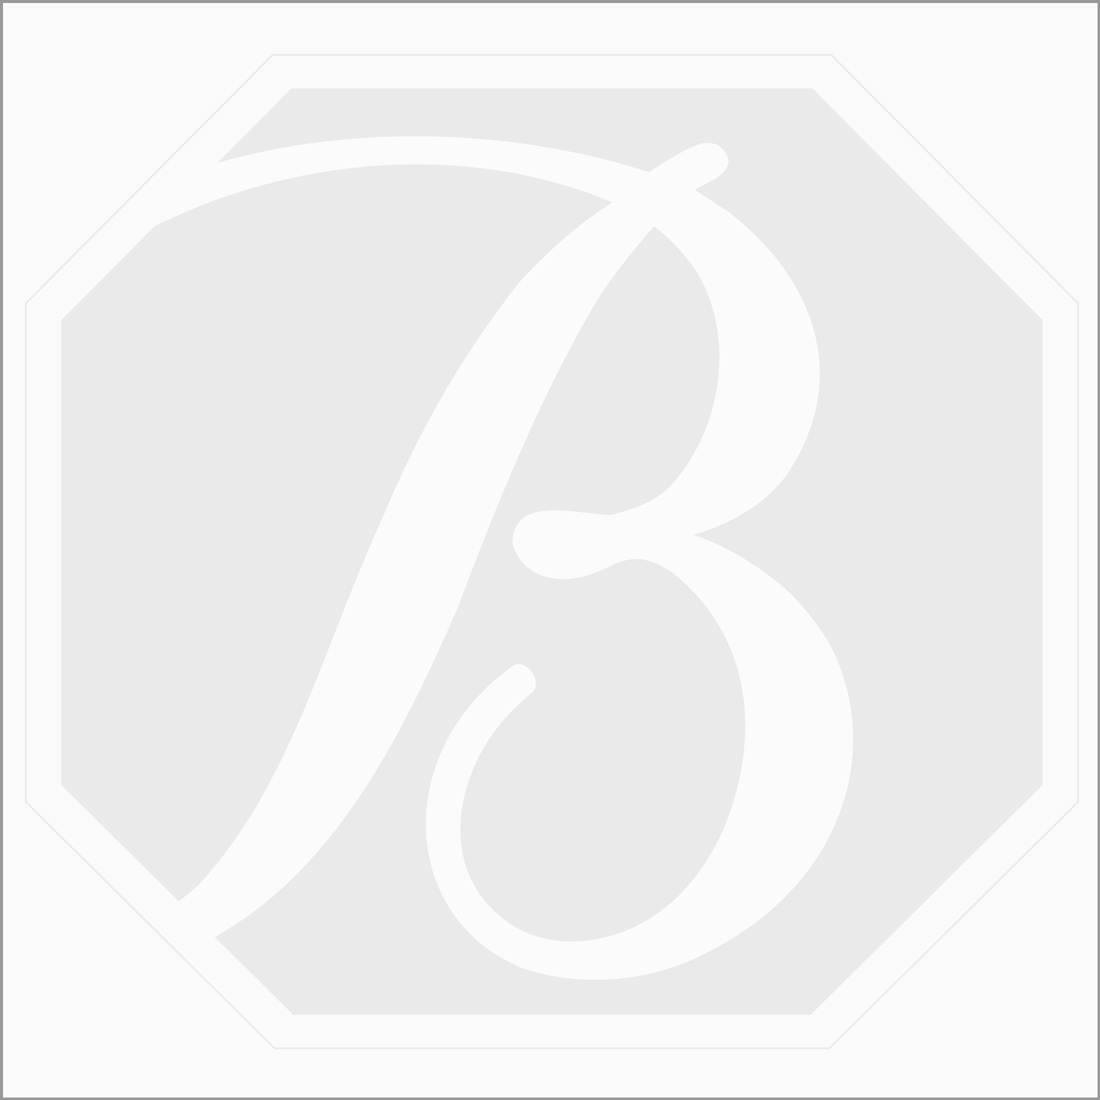 3 Pcs - 17.54 ct. - Bi-Color Tourmaline Rose Cut -13.6 x 11.9 x 4.5 mm to 16.4 x 13.2 x 3.8 mm (TRC1102)